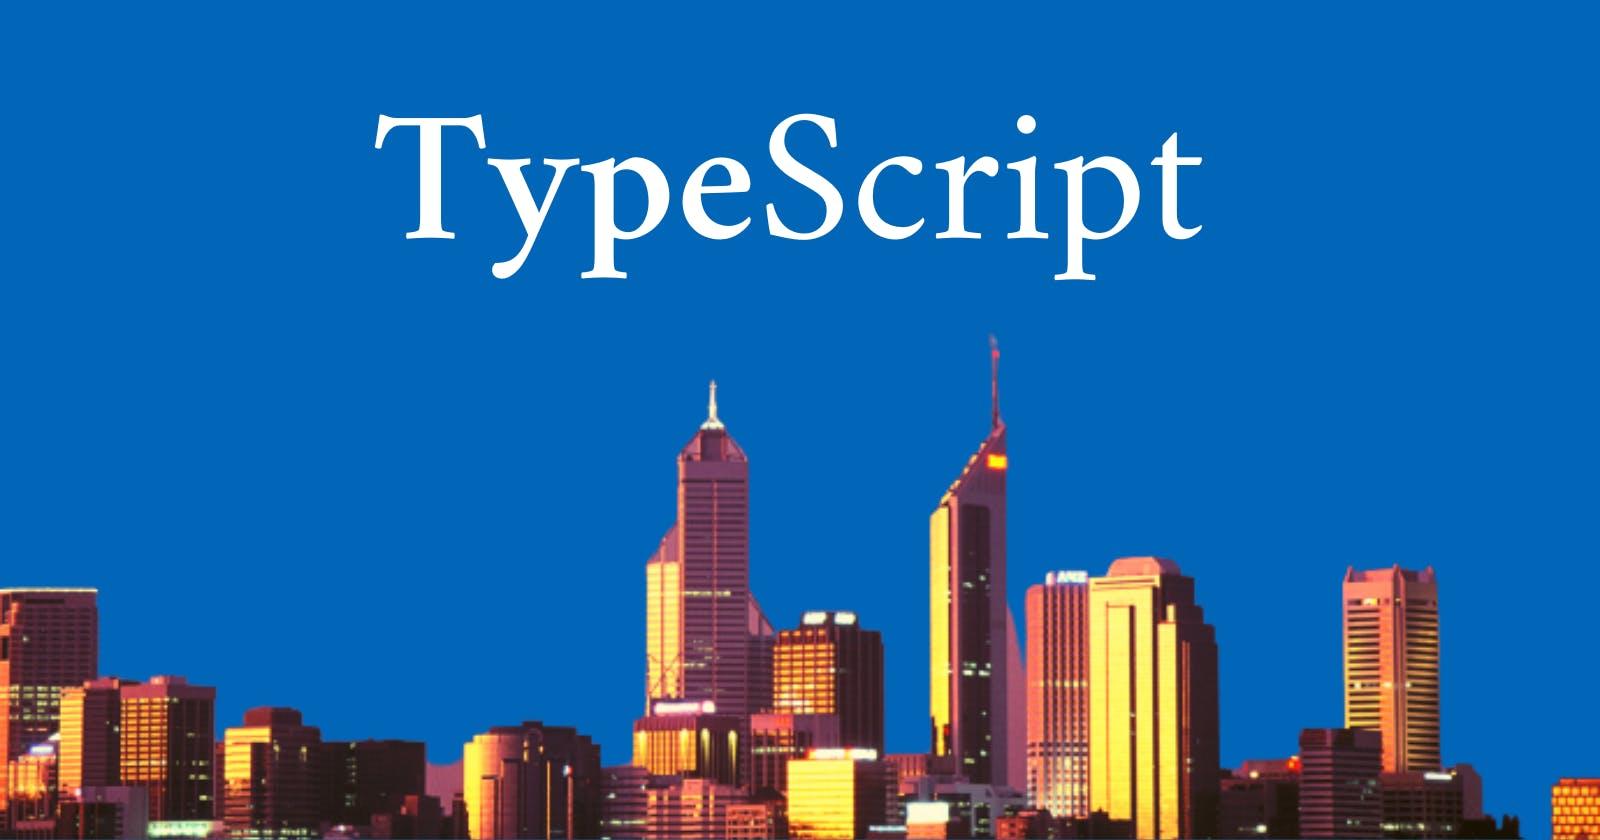 Typescript Best Practices #1 - Always prefer 'Type Declaration' over 'Type Assertion'